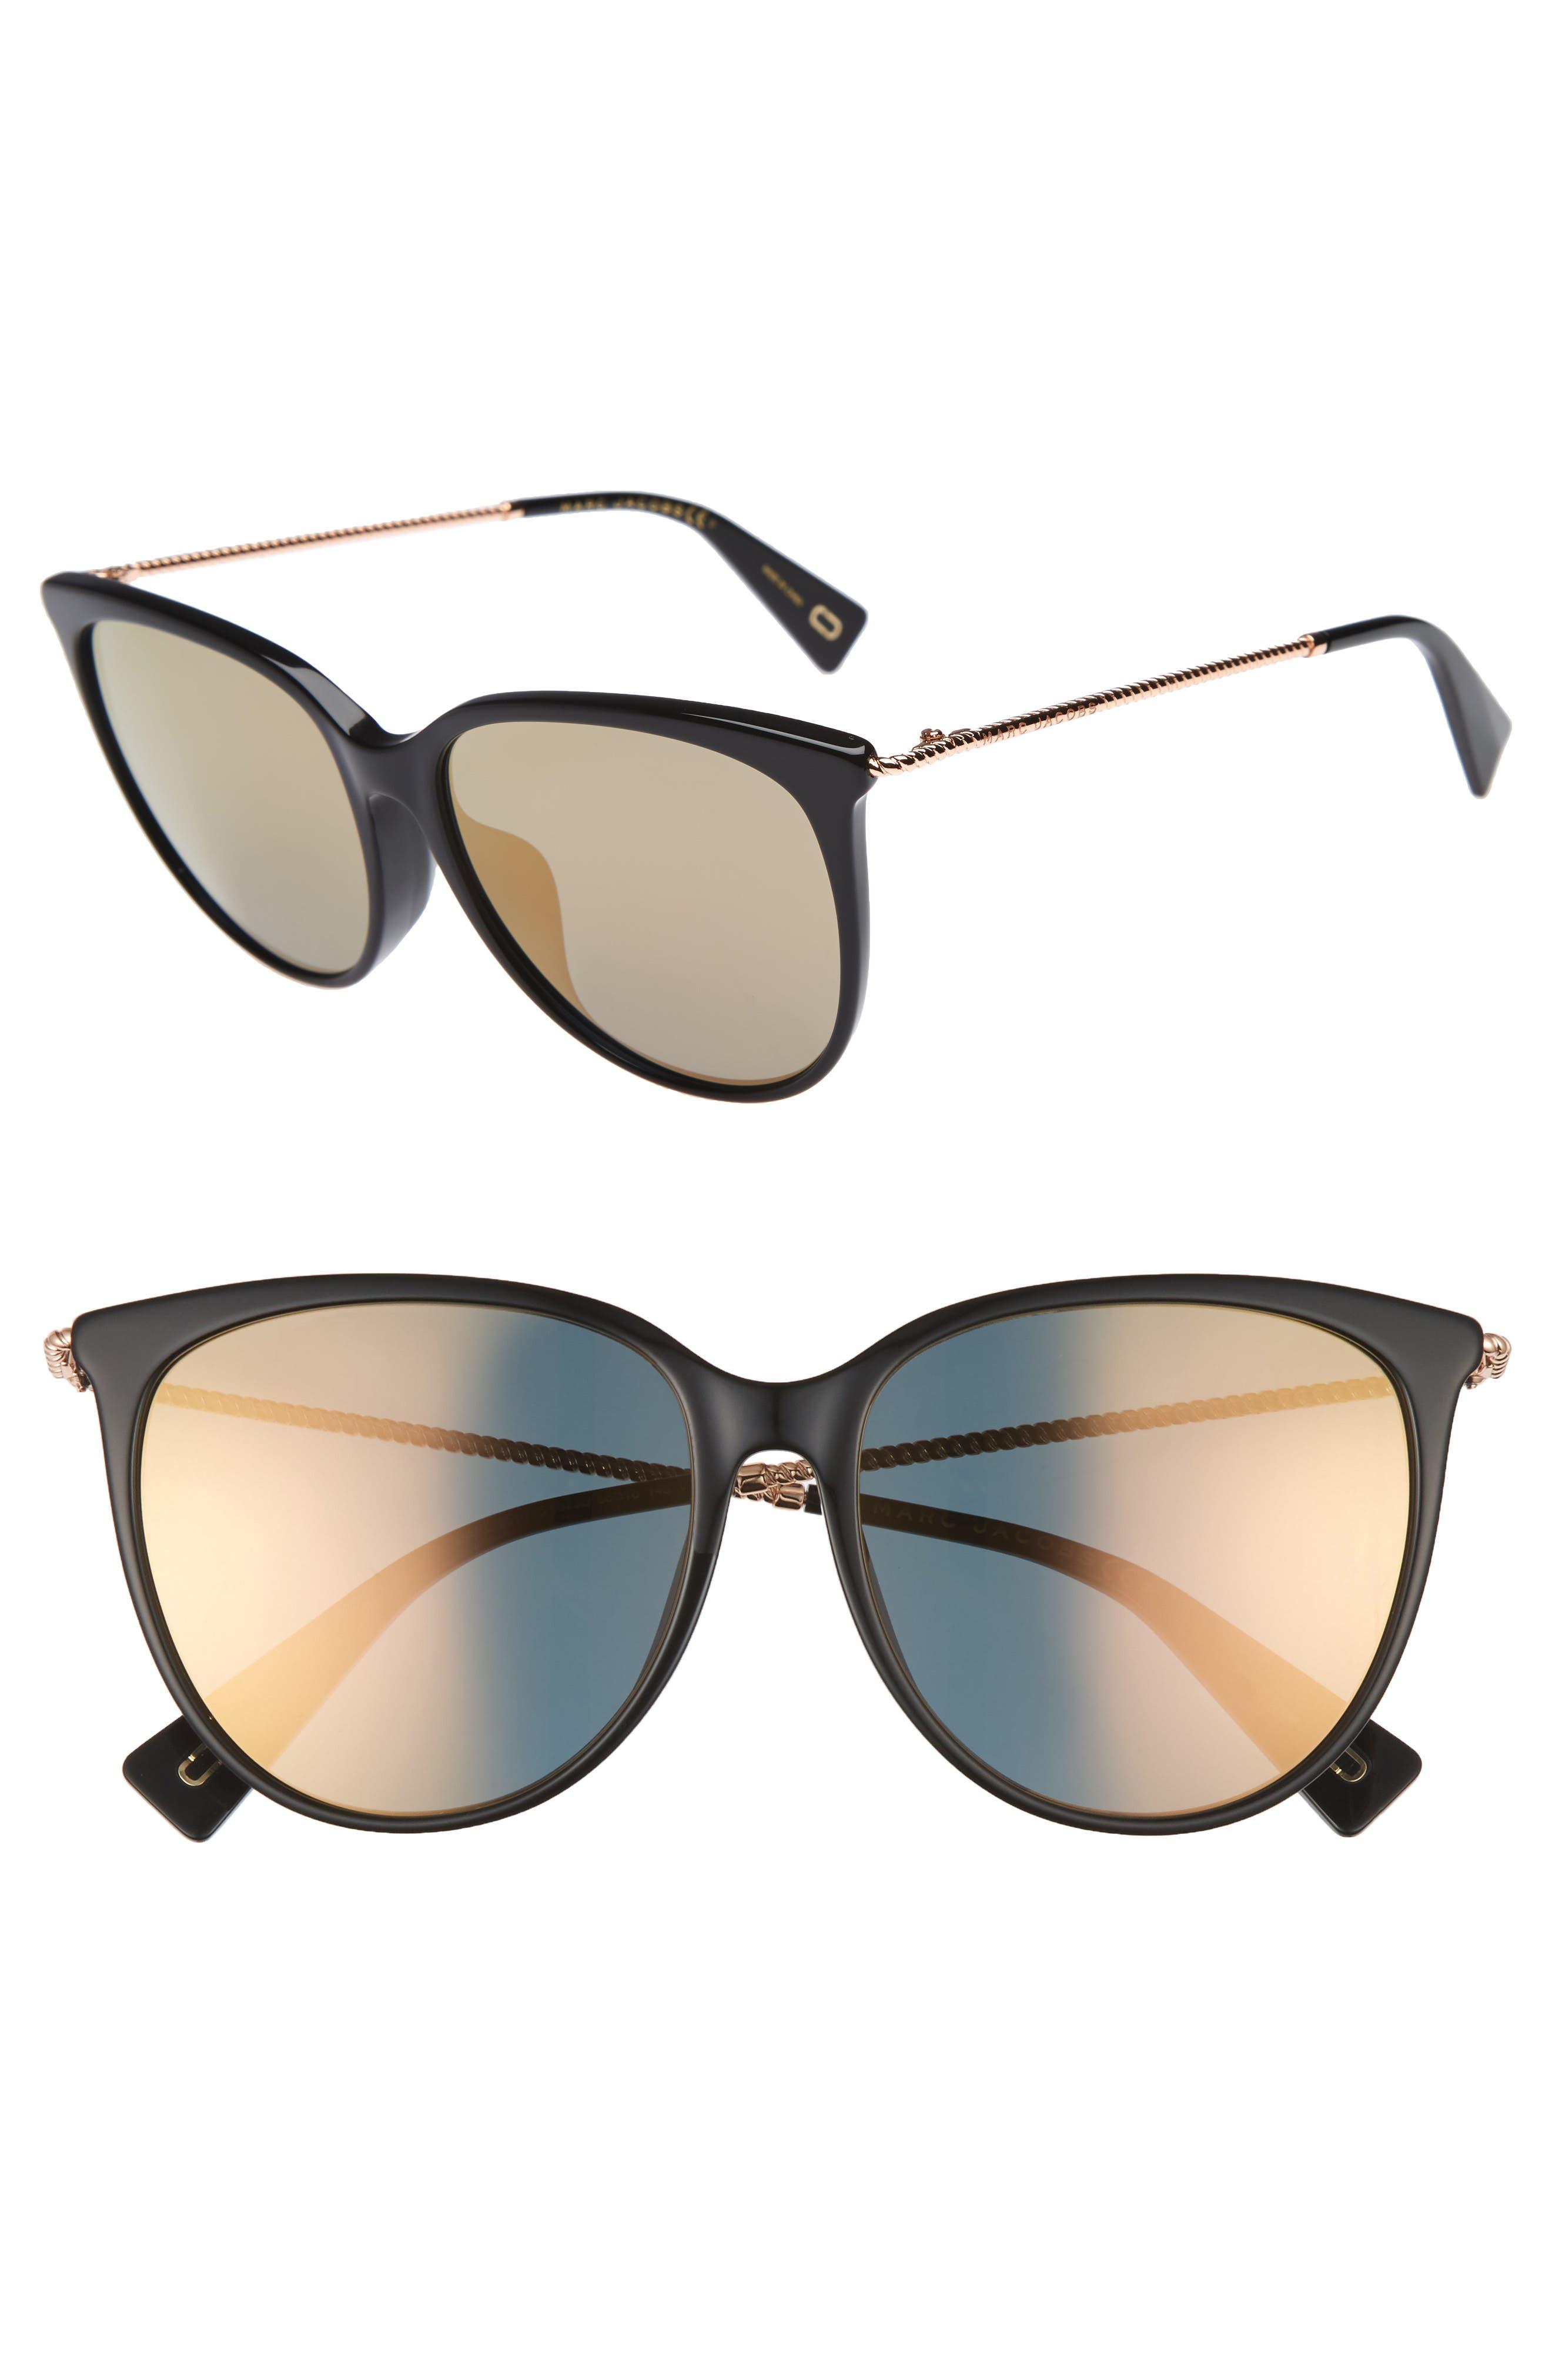 MARC JACOBS 56mm Cat Eye Sunglasses, Main, color, 001